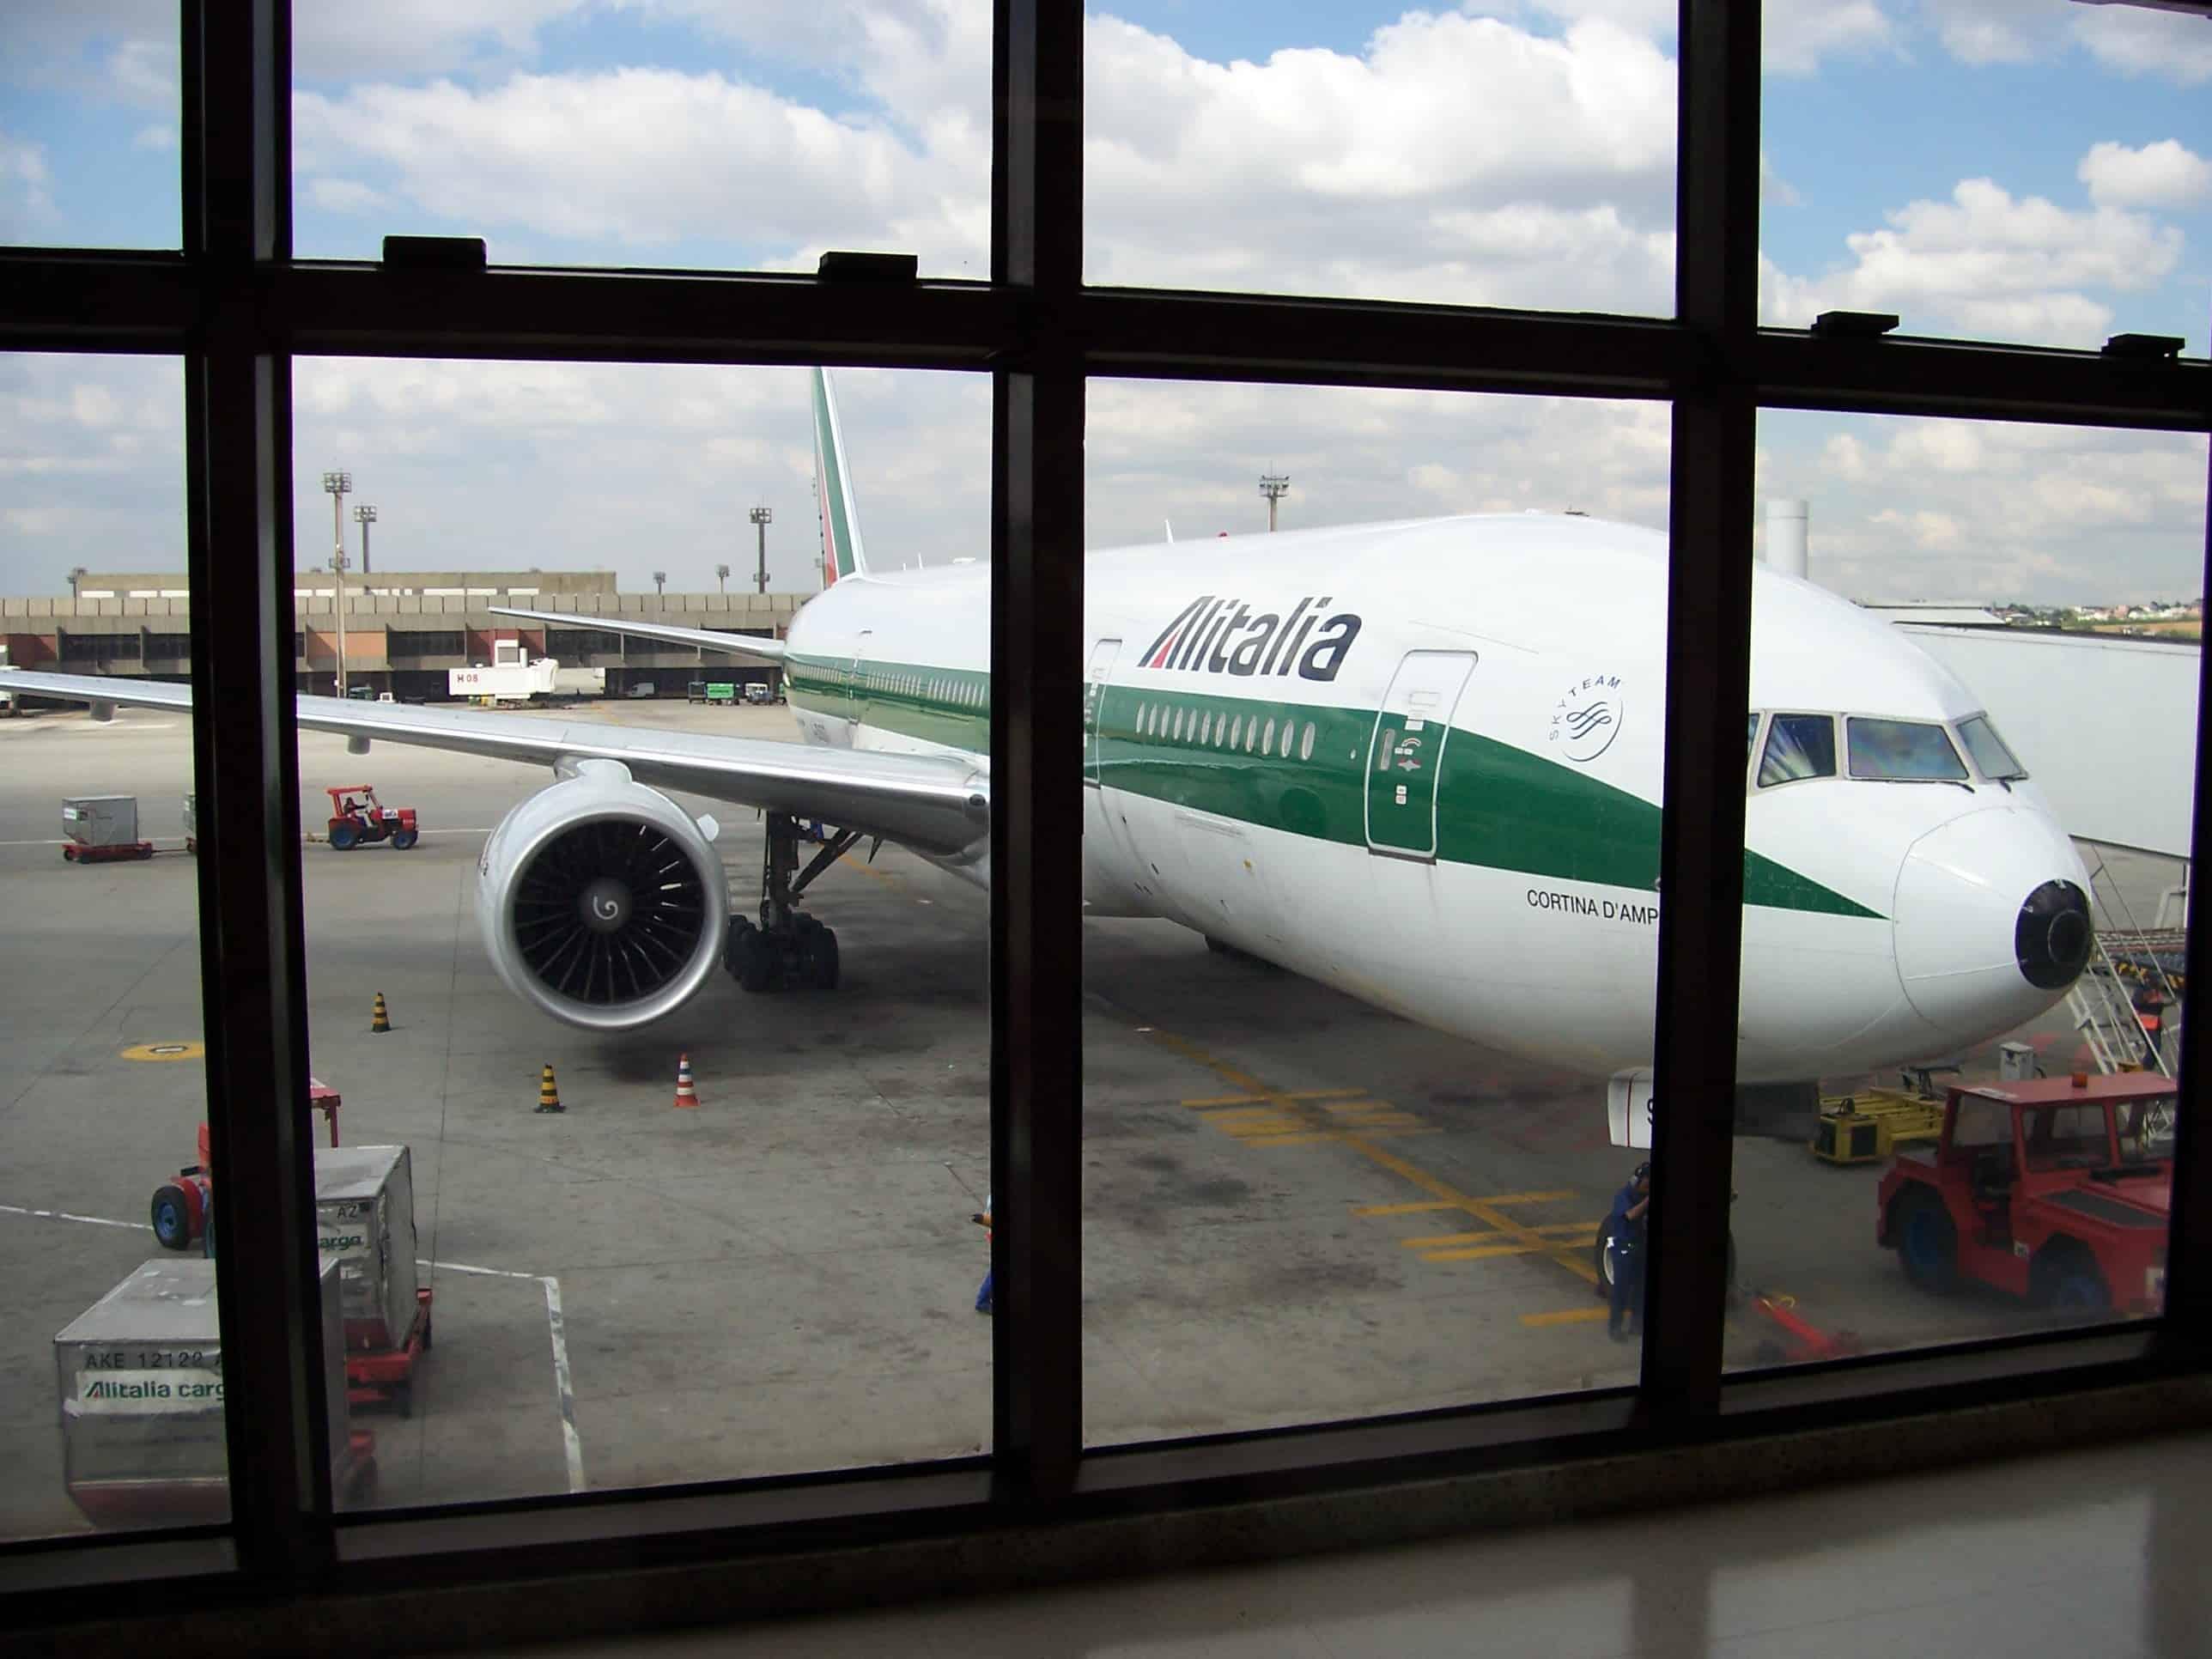 Voo pela Alitalia